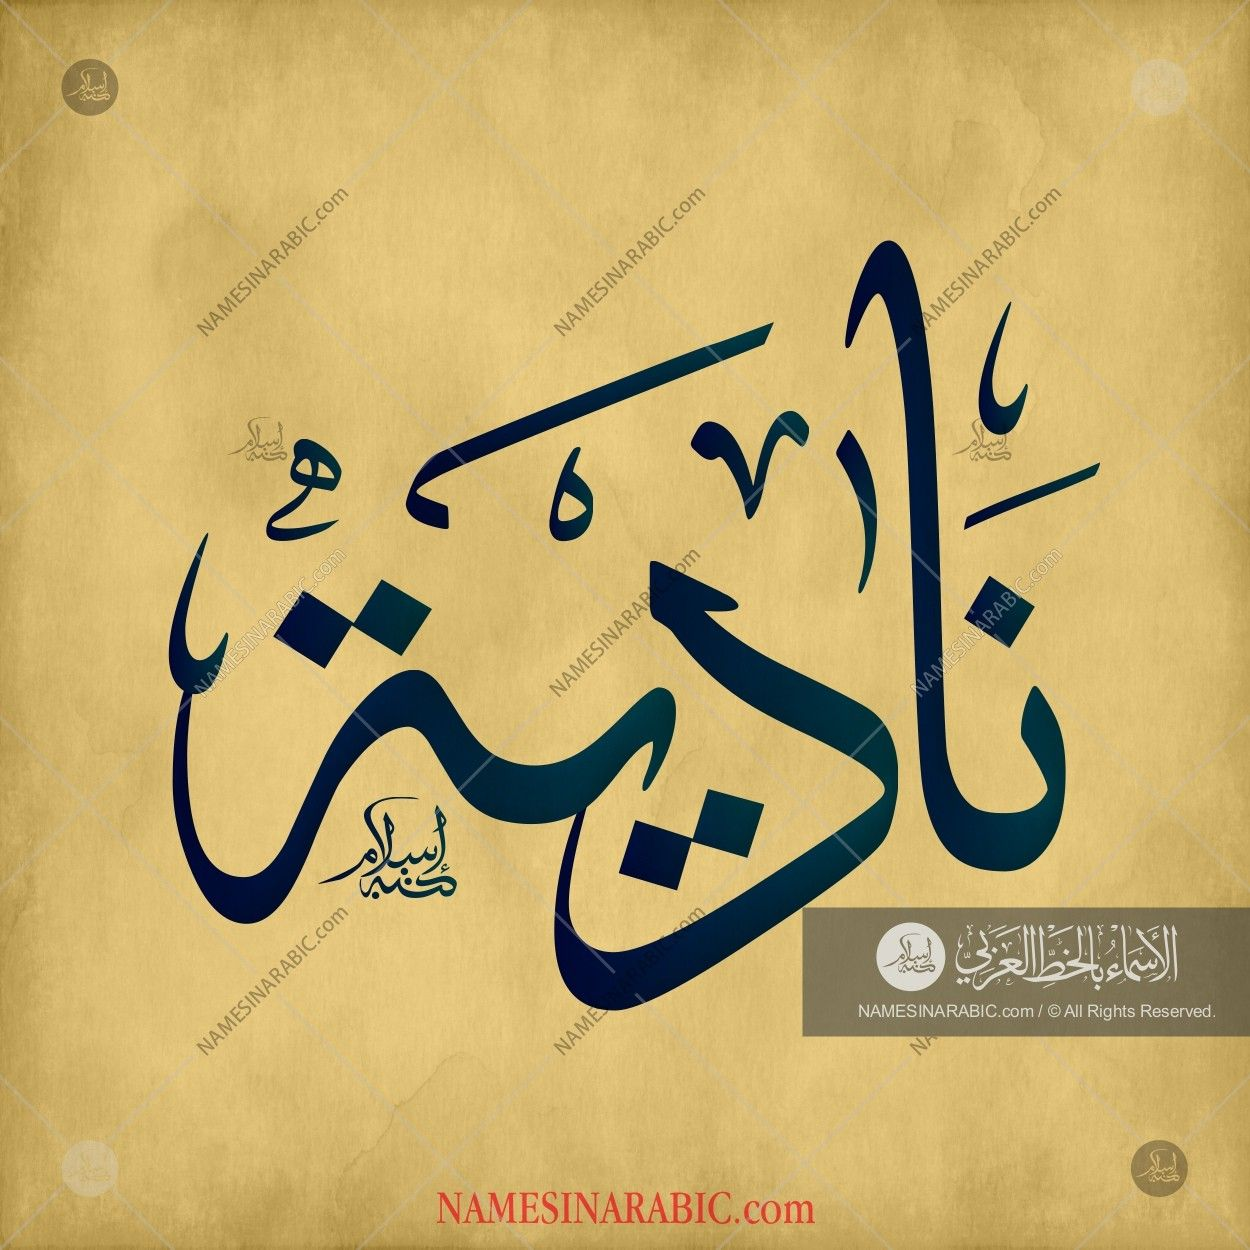 Nadia نادية Names In Arabic Calligraphy Name 1441 Calligraphy Name Arabic Calligraphy Design Hand Lettering Styles